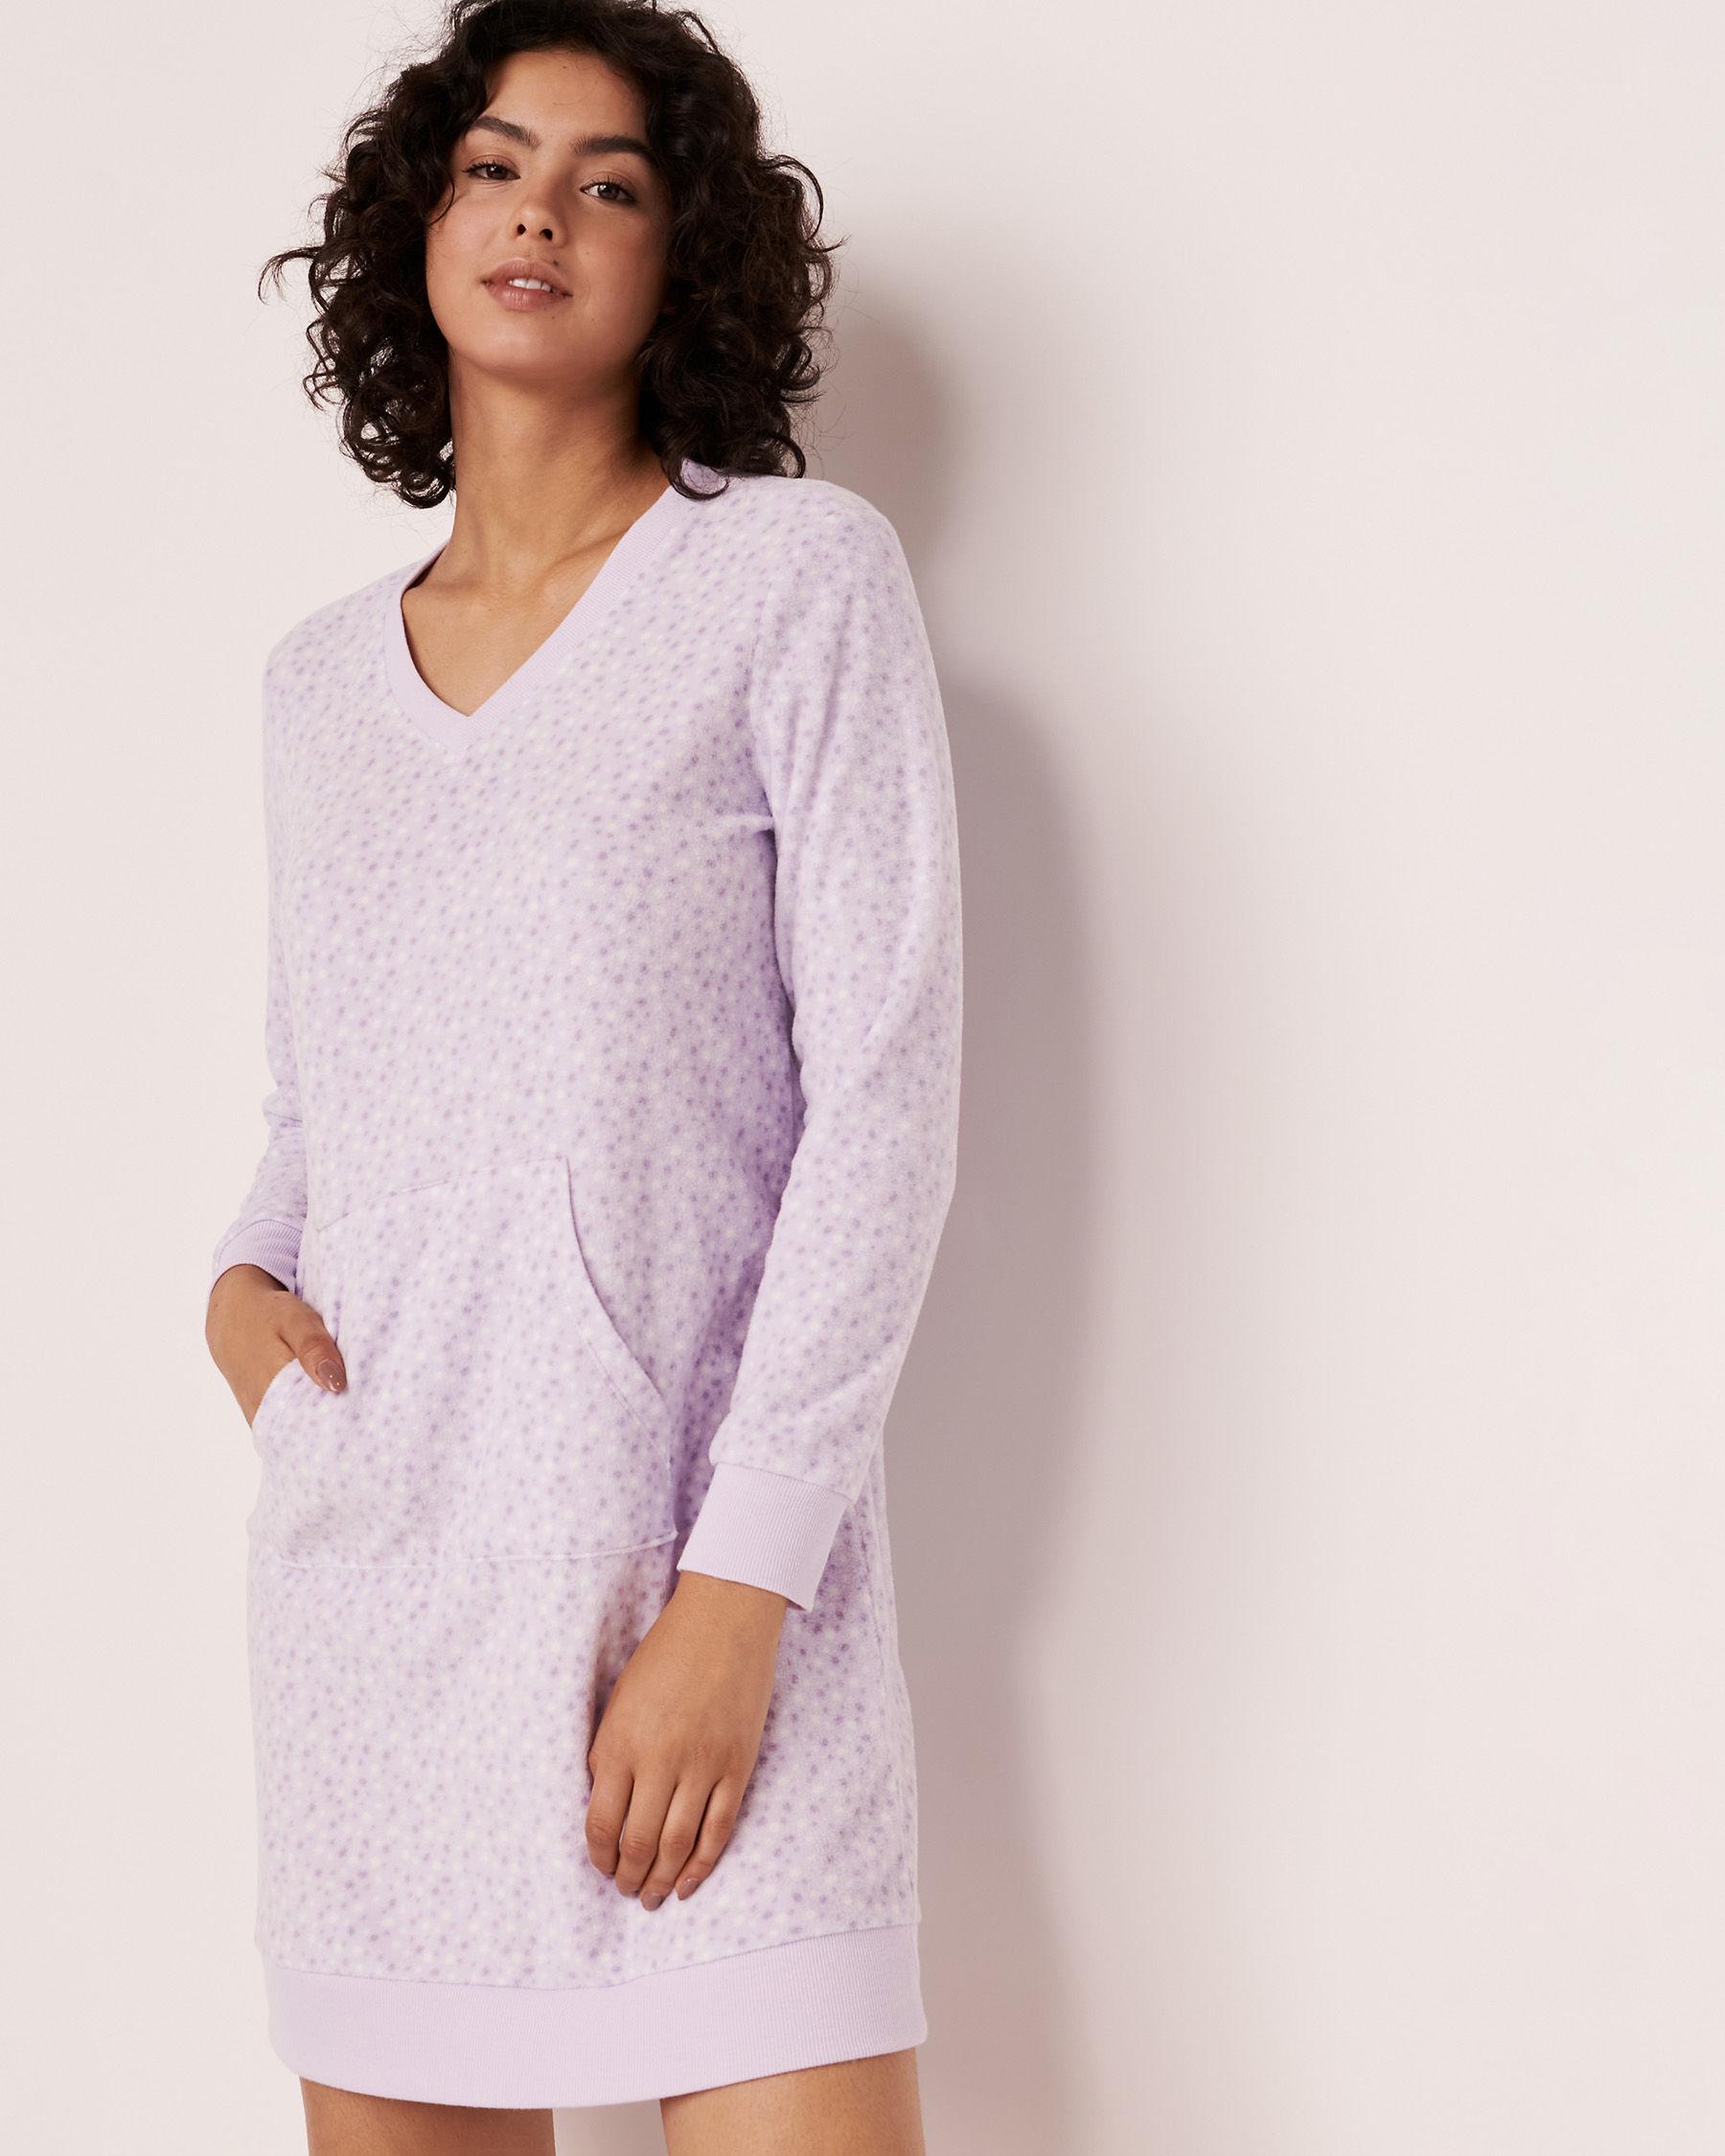 LA VIE EN ROSE Micropolar Long Sleeve Sleepshirt Multi dots 40500098 - View1